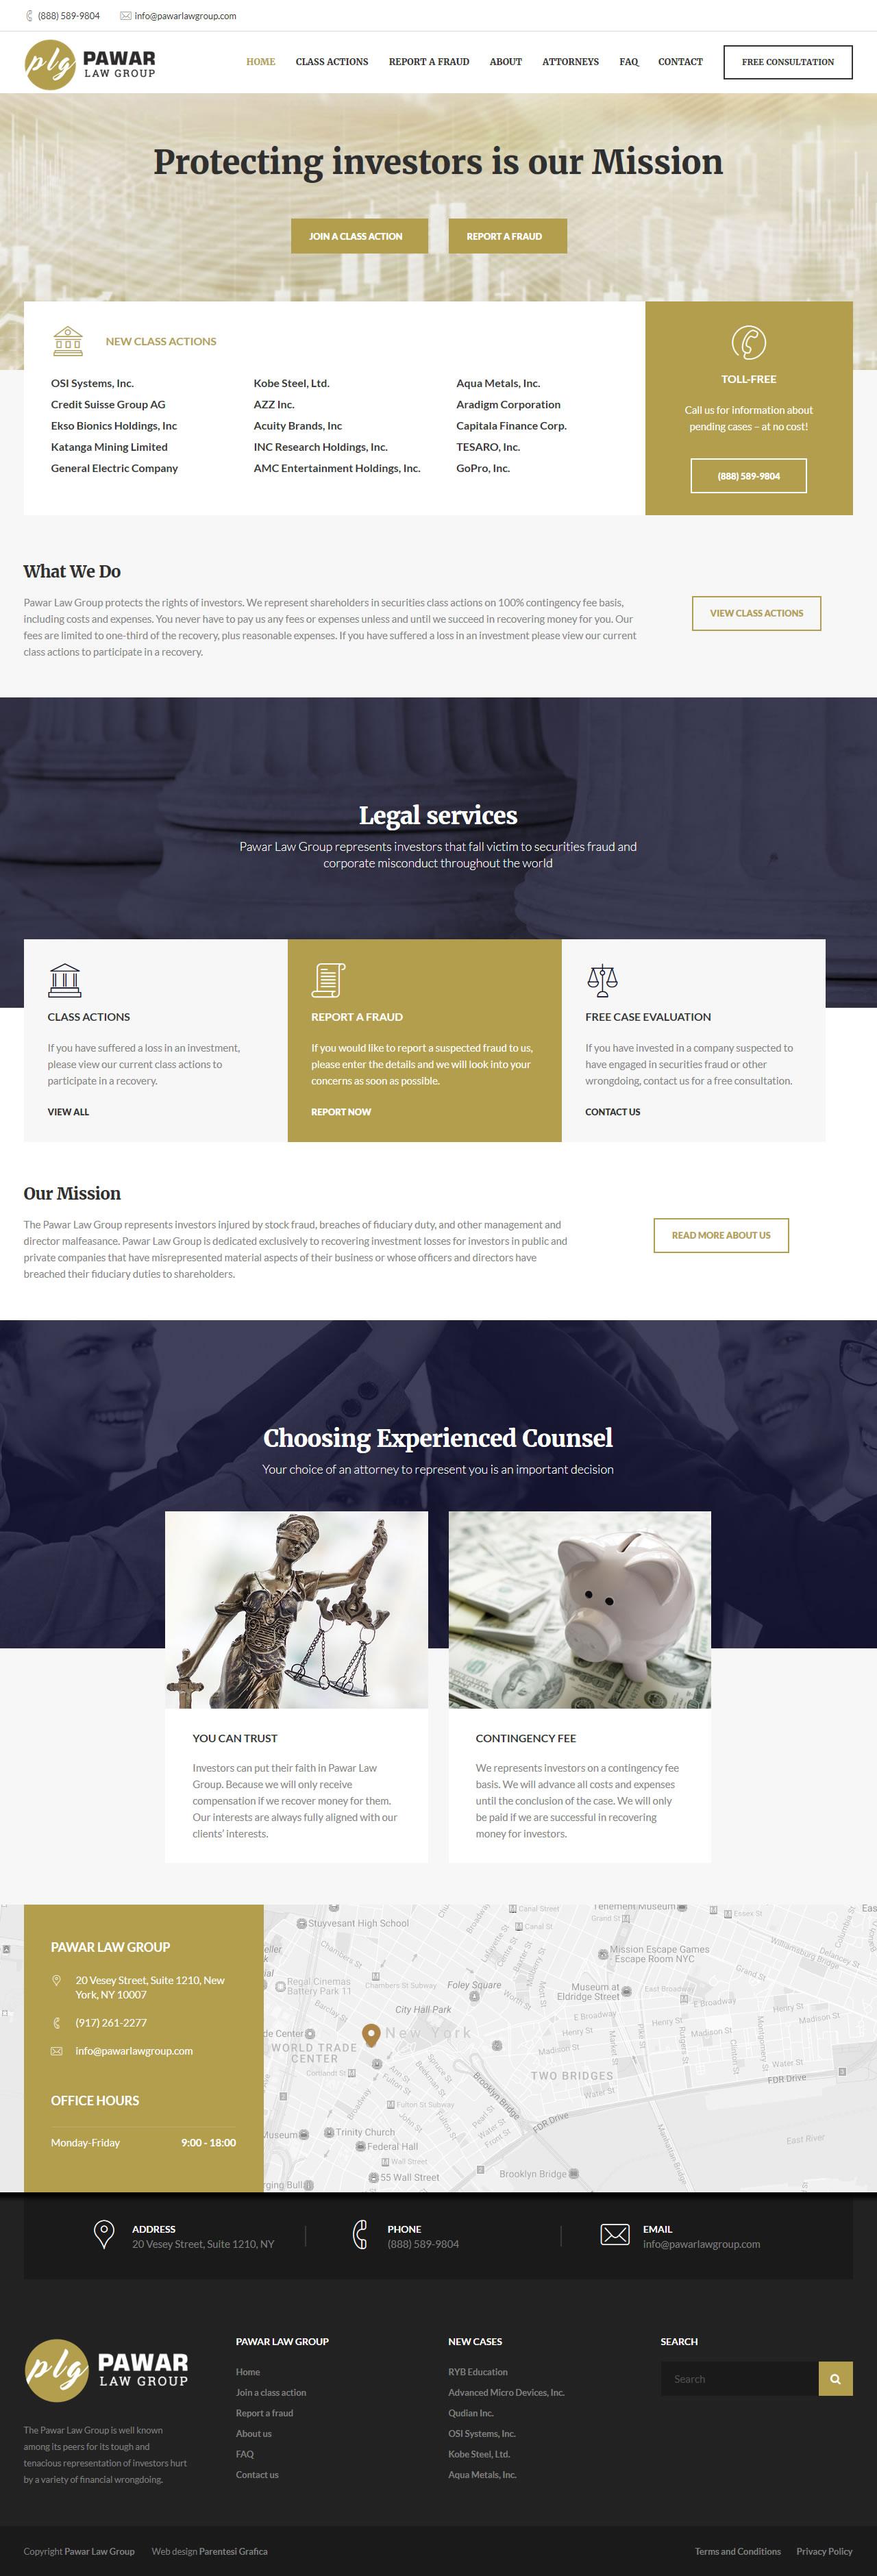 Pawar Law Group - homepage